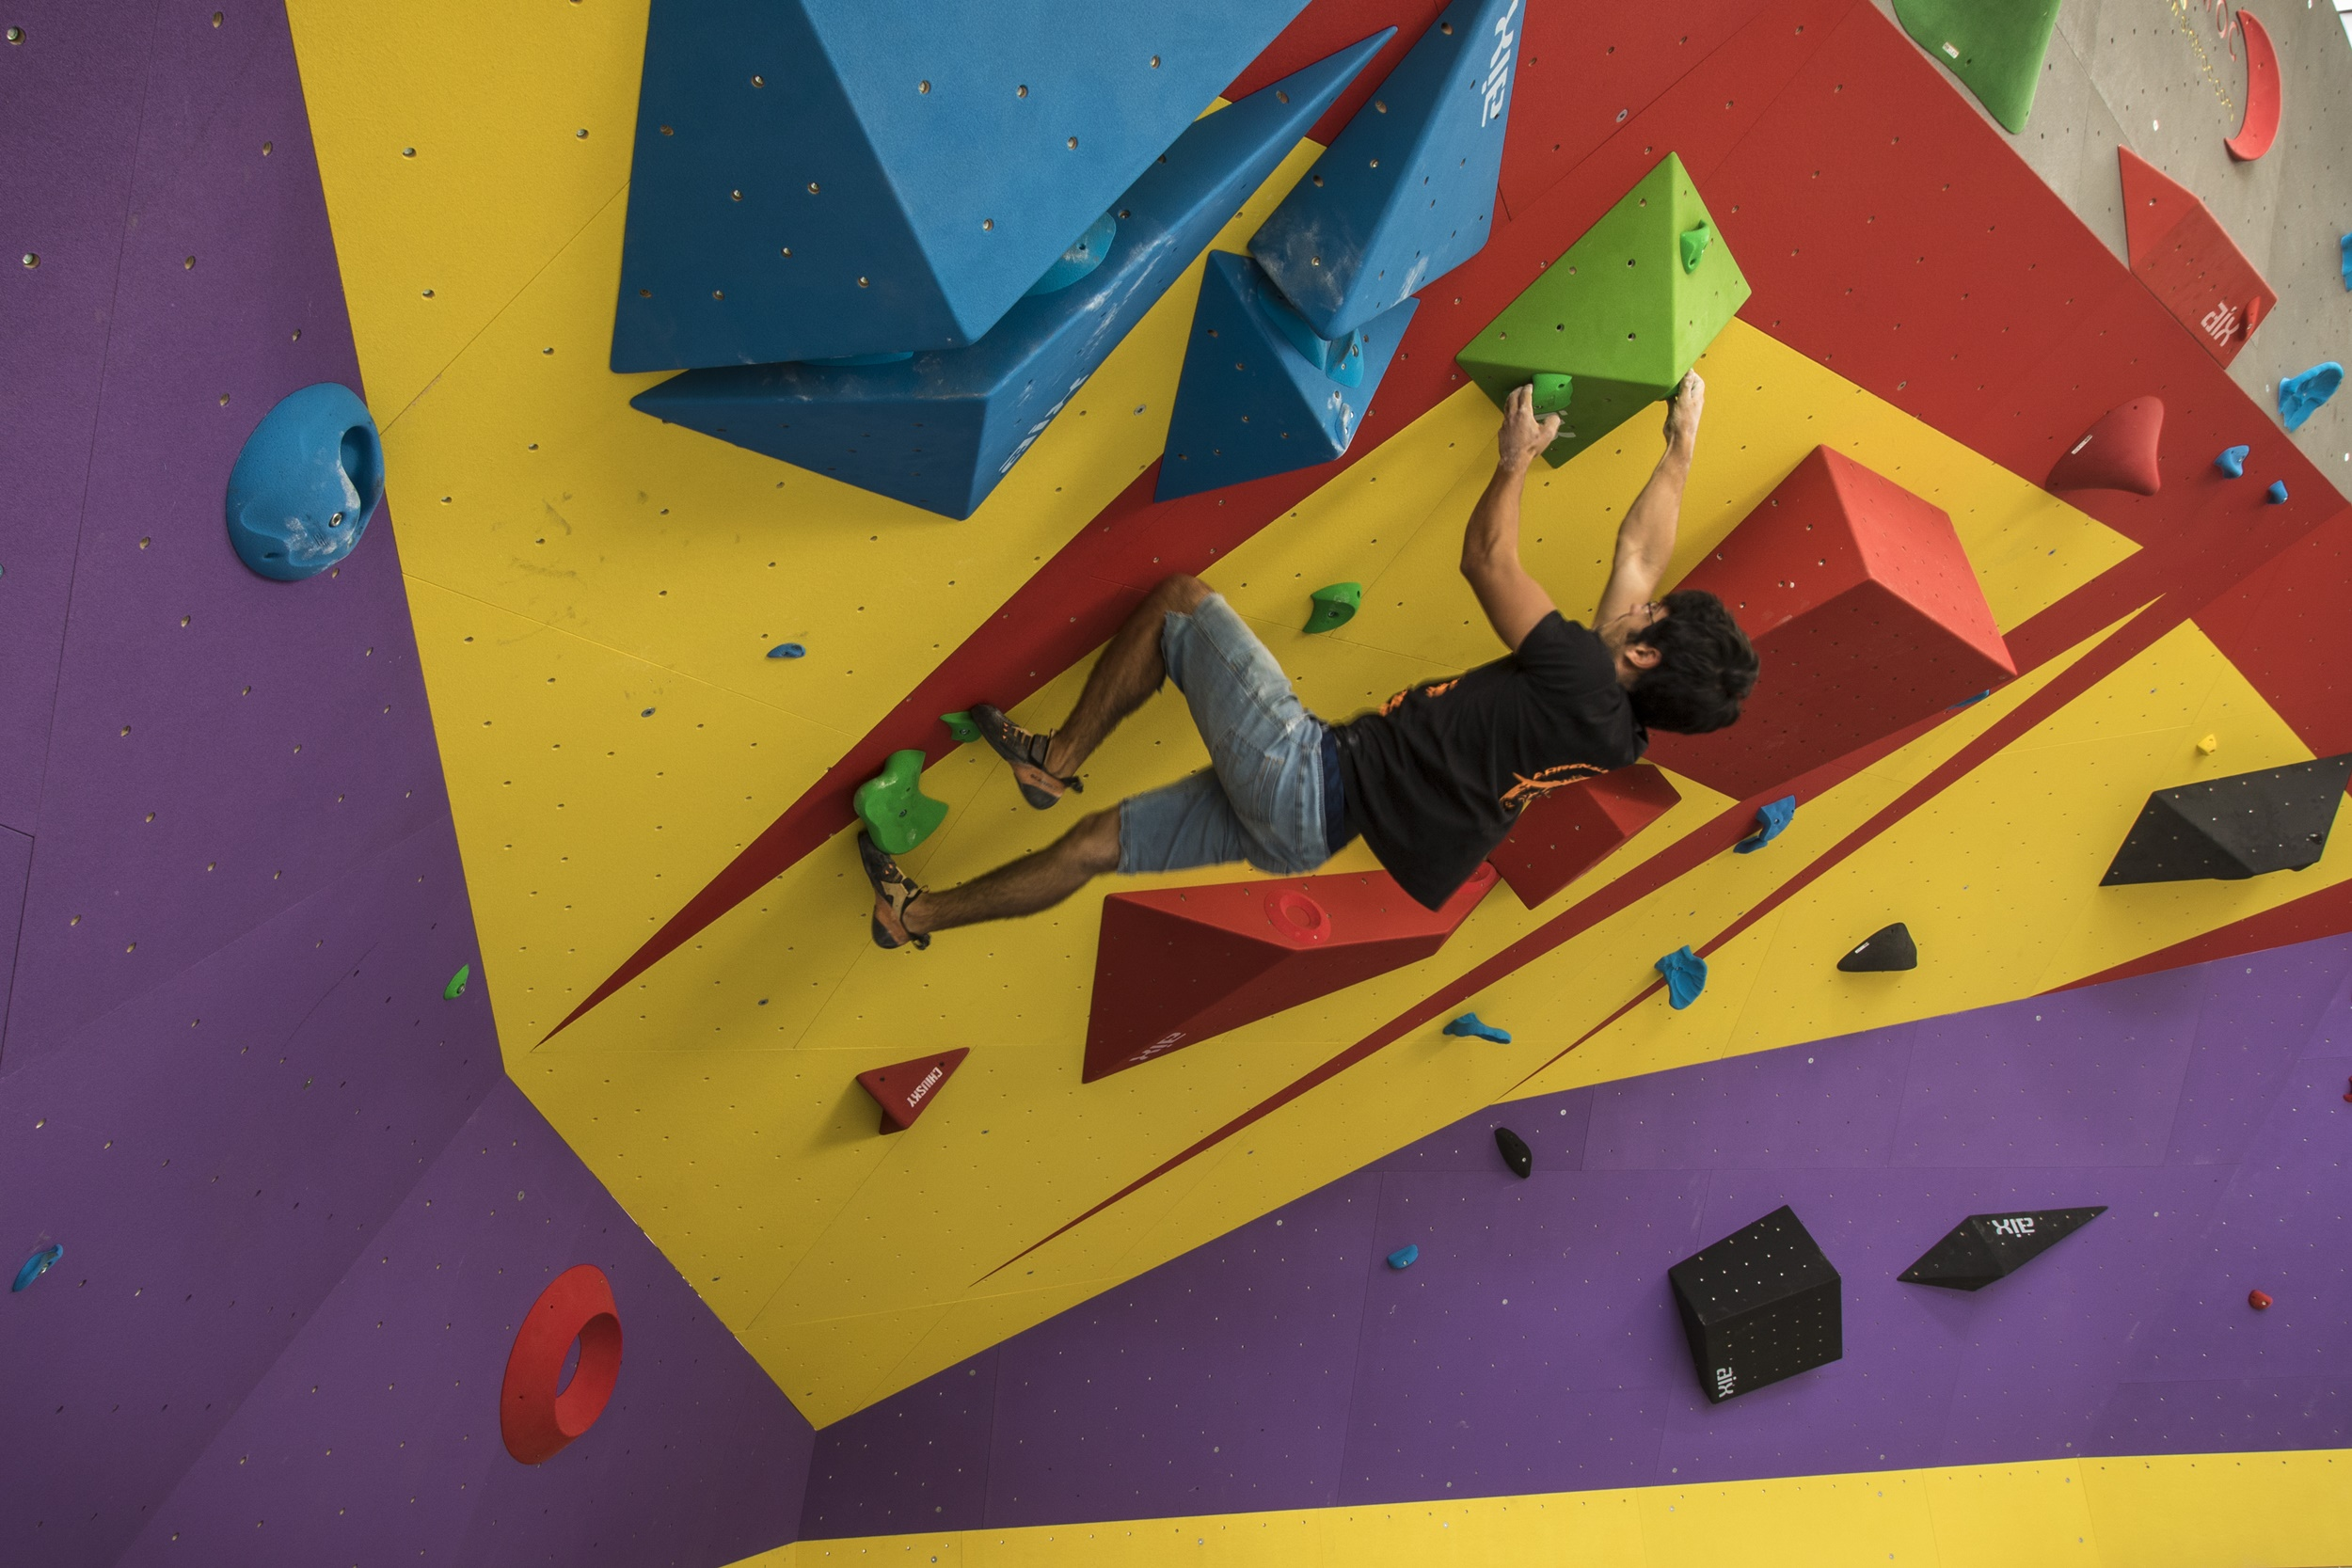 Scalare Pareti Milano : Apre a milano manga climbing center outdoor magazine